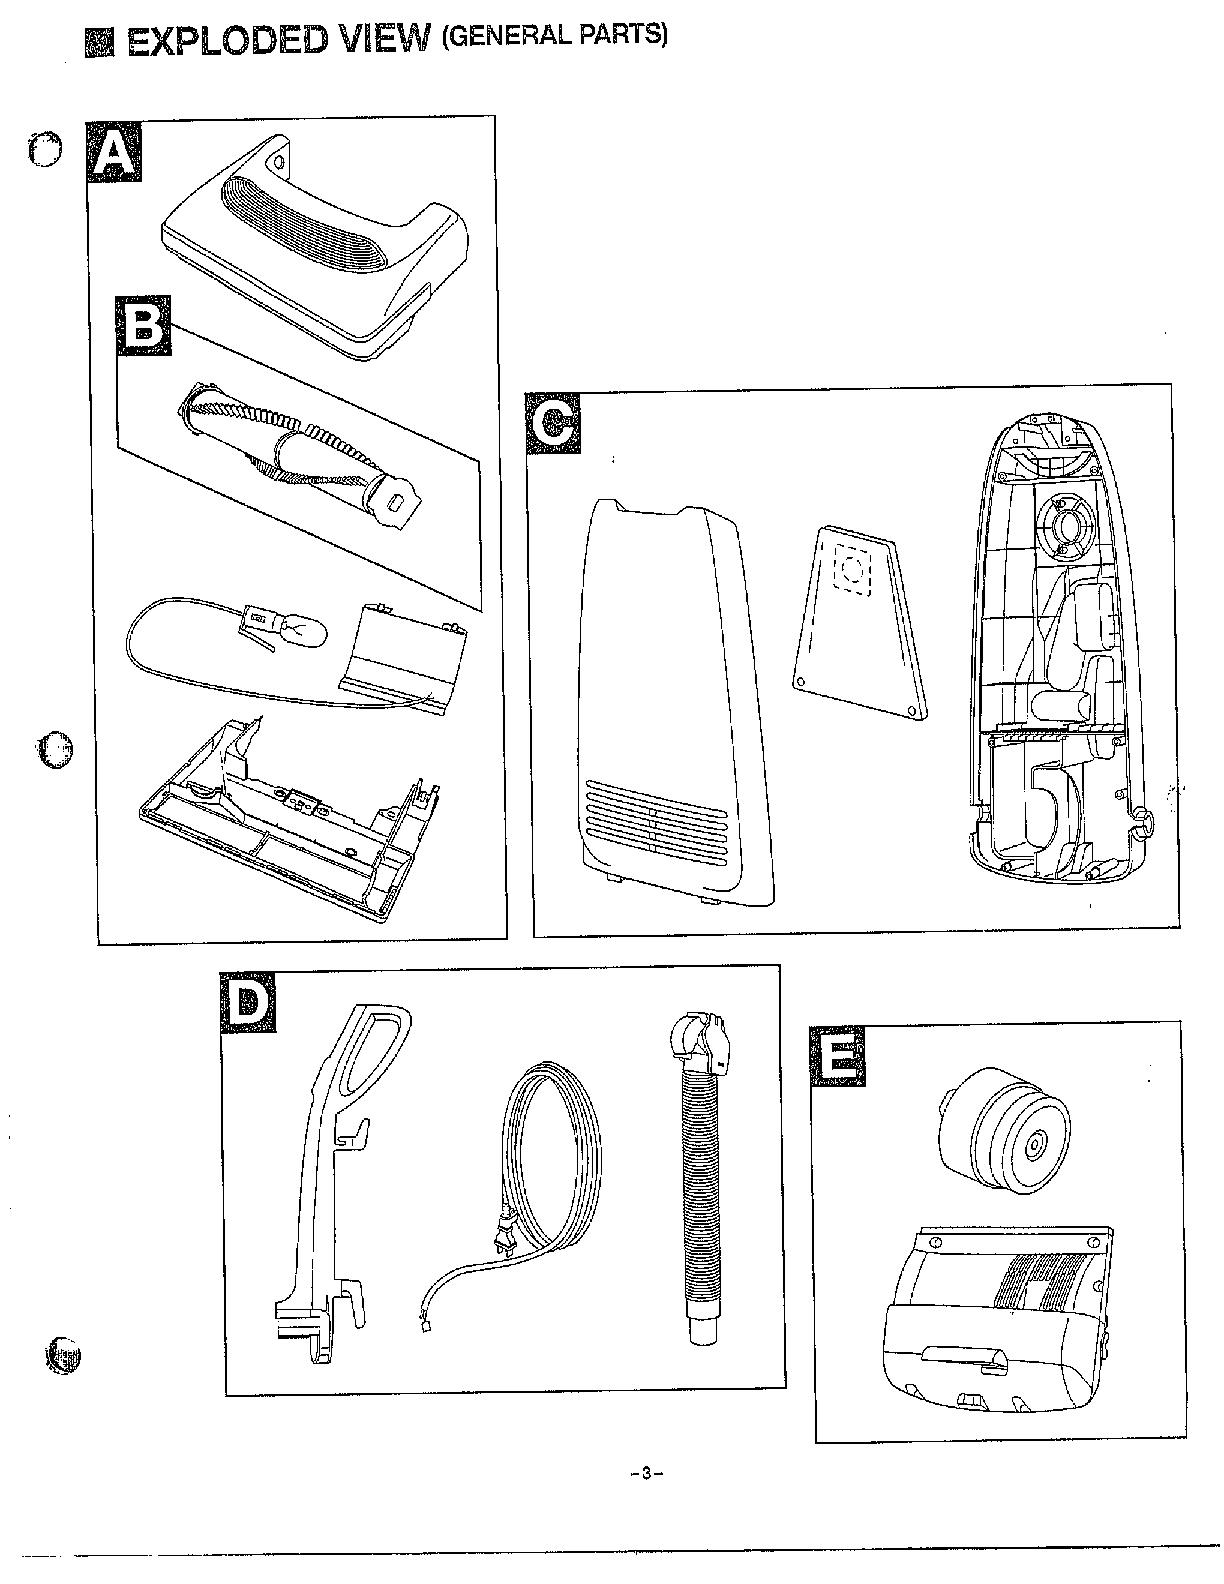 Panasonic model MC-6955 vacuum, upright genuine parts